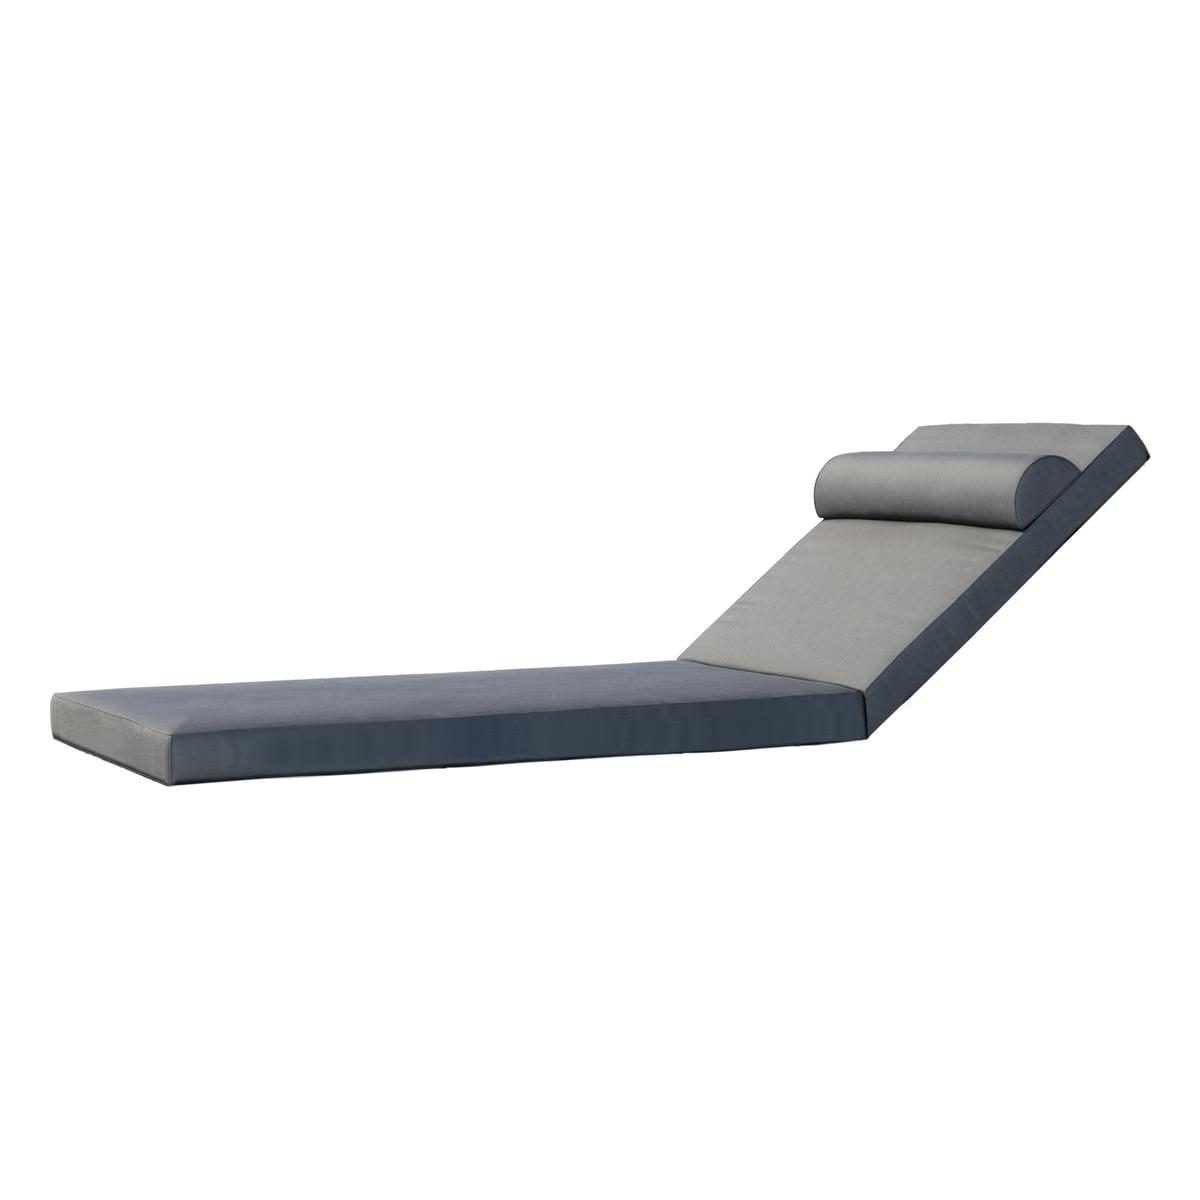 auflage sonnenliege namme deine shoppingwelt. Black Bedroom Furniture Sets. Home Design Ideas